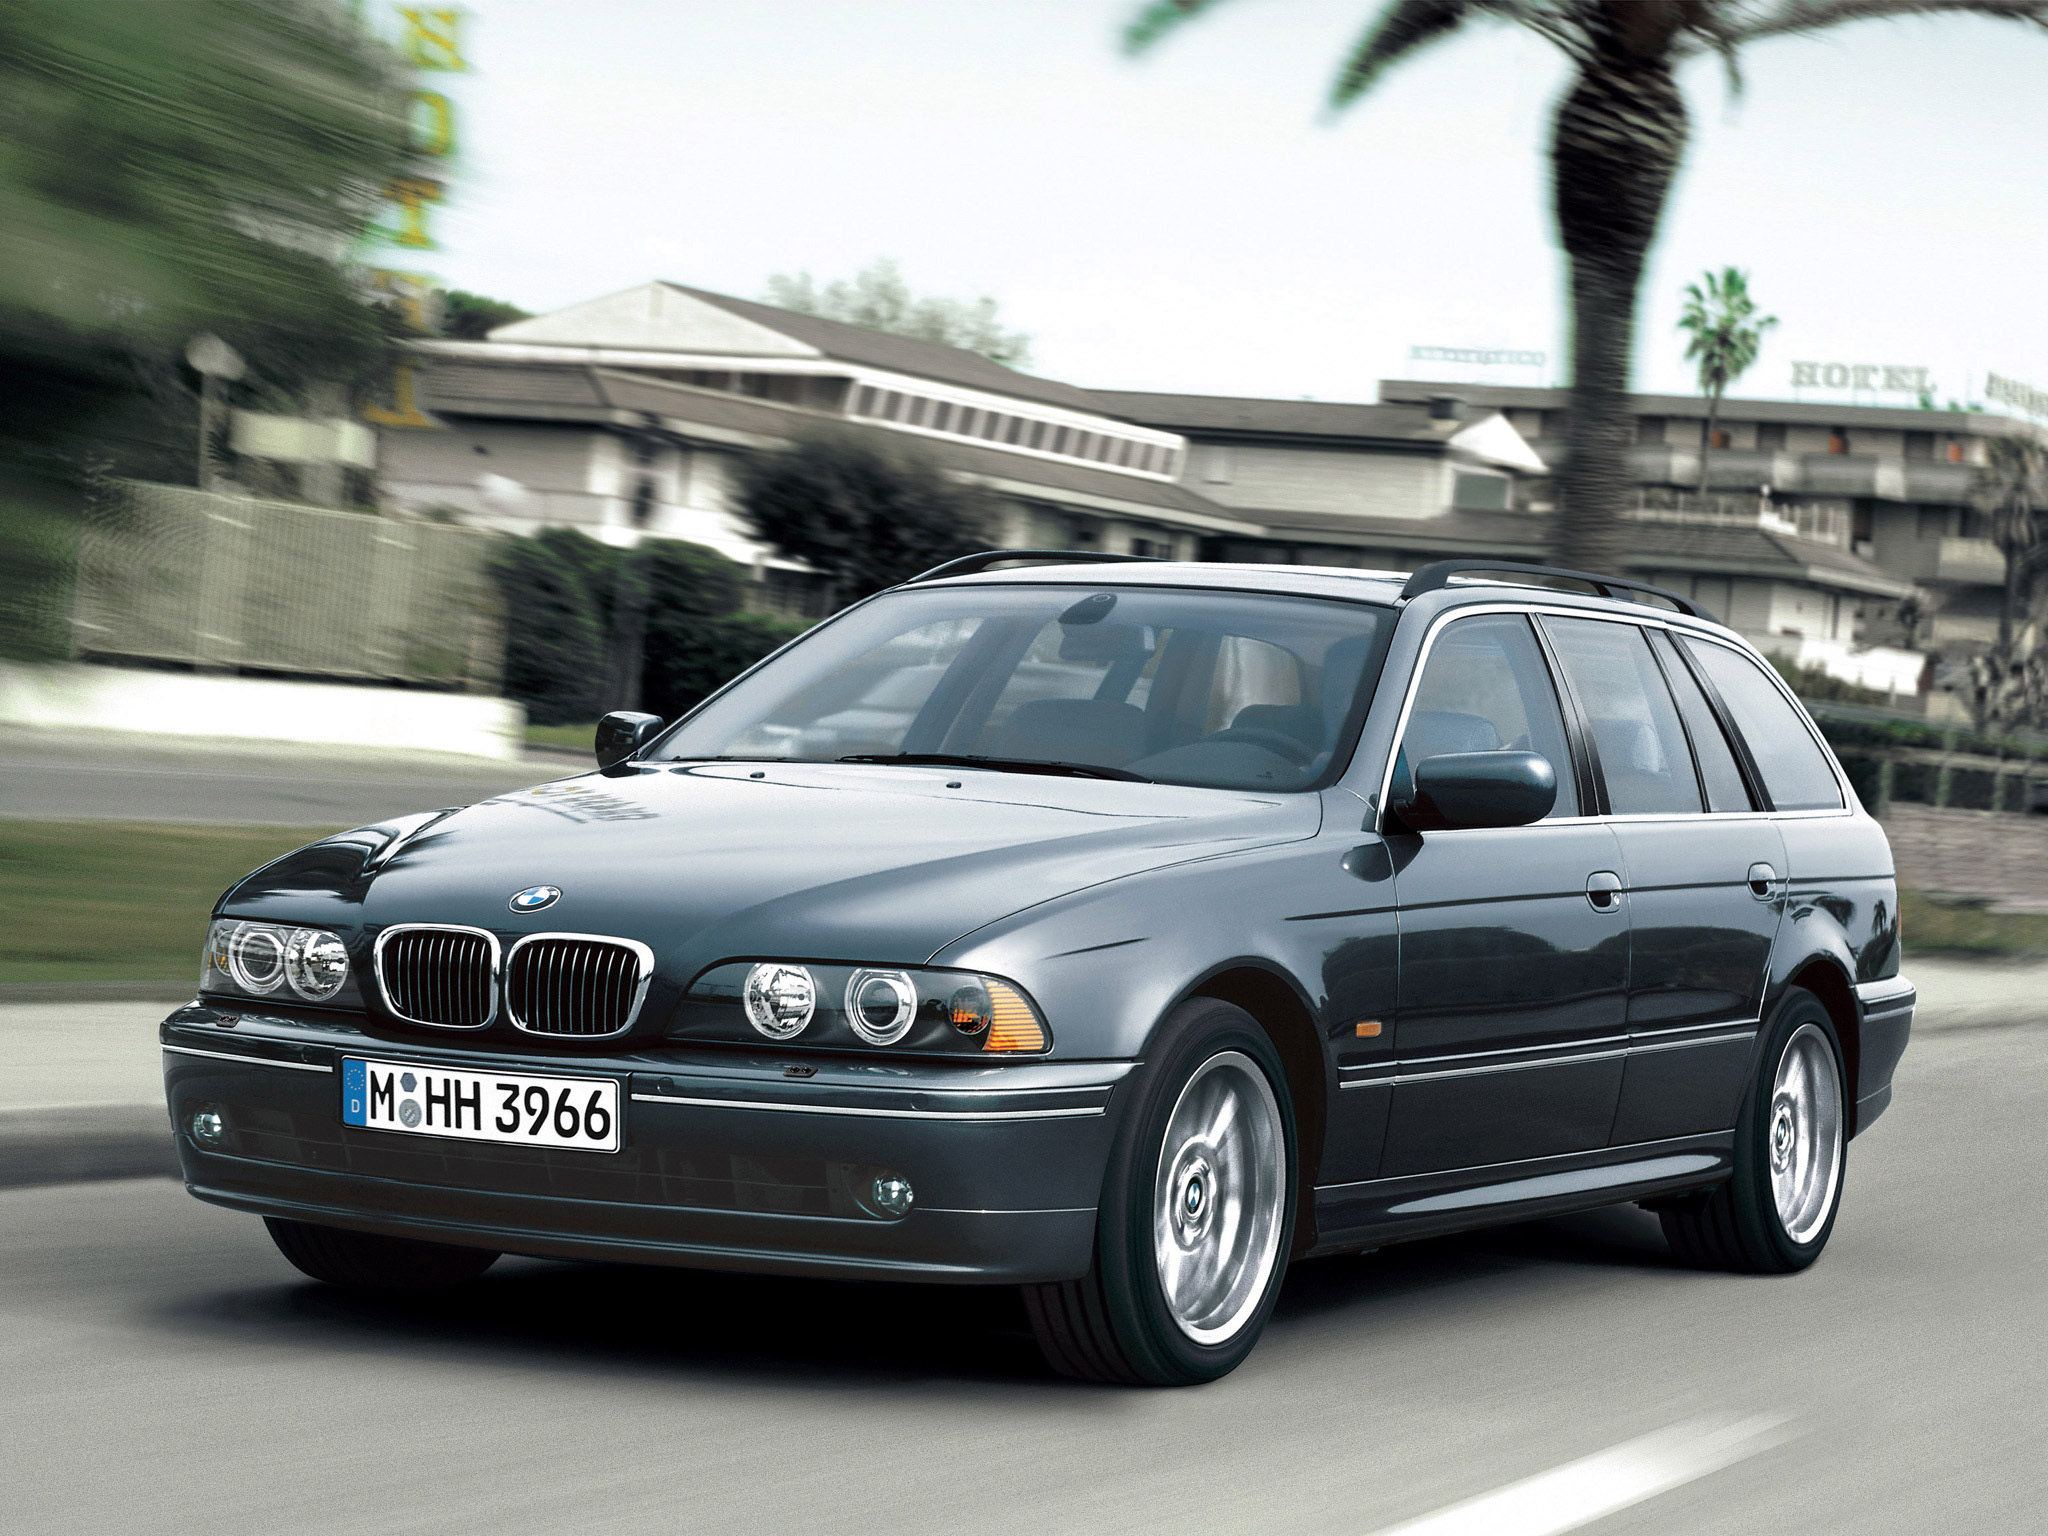 Topic20209 E39 520i Uni Schwarz 17 5er BMW   E39 as well Bmw 528i 1980 also Topic43420 BMW e39 540i Matt   OEM Style 5er BMW   E39 also 1998 Bmw 5 Series Pictures C22306 pi35904864 also Watch. on 2001 bmw 540i